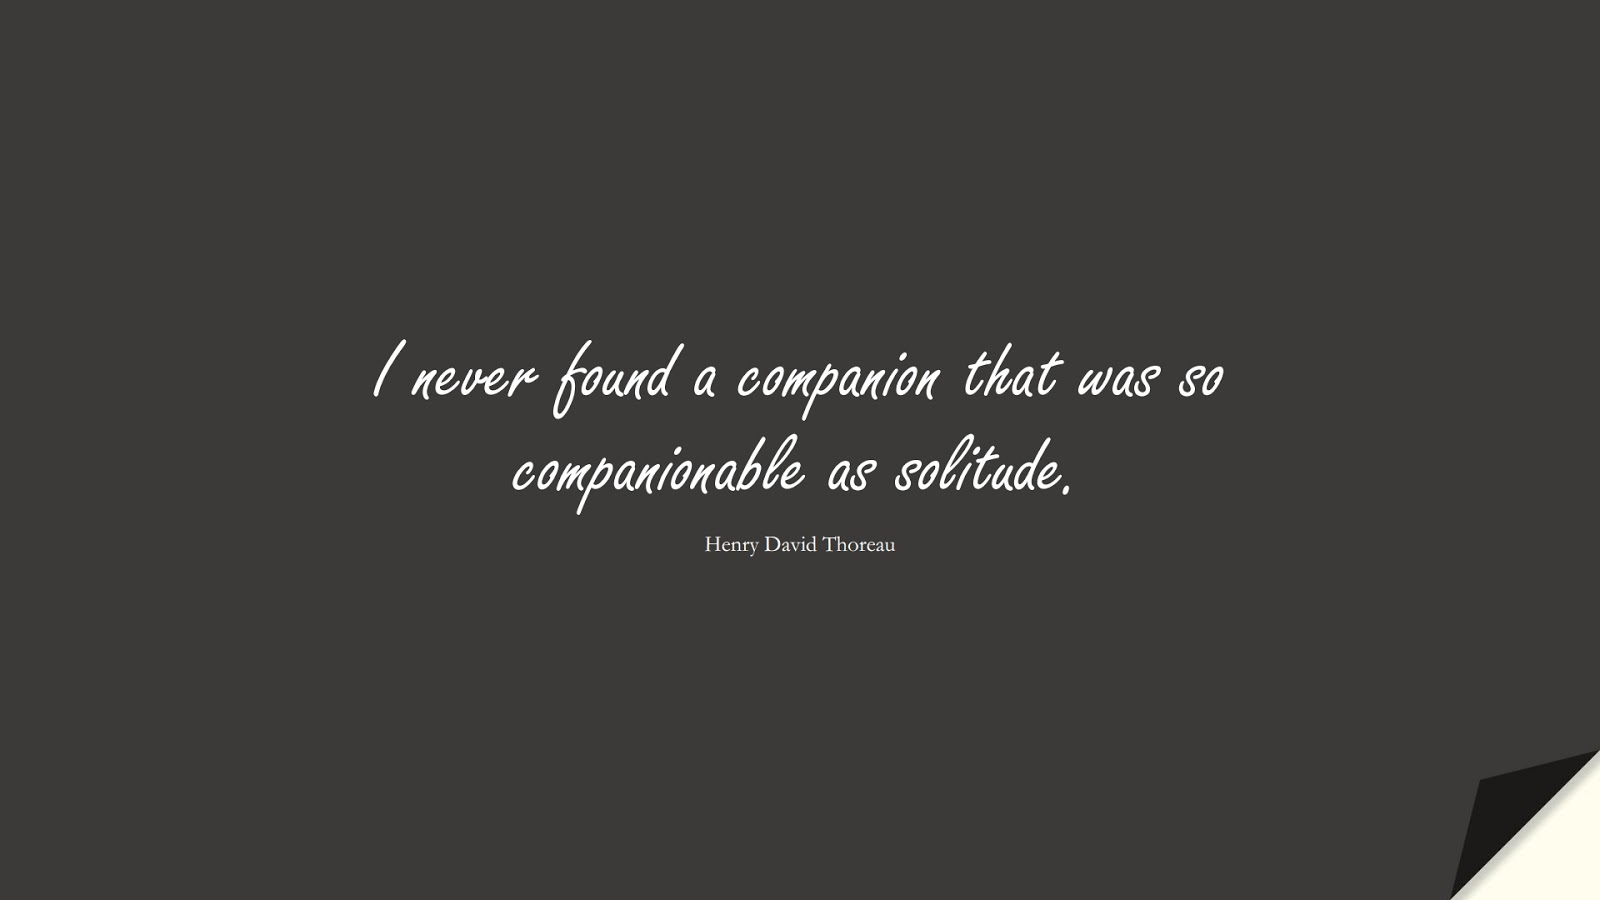 I never found a companion that was so companionable as solitude. (Henry David Thoreau);  #PricelessQuotes